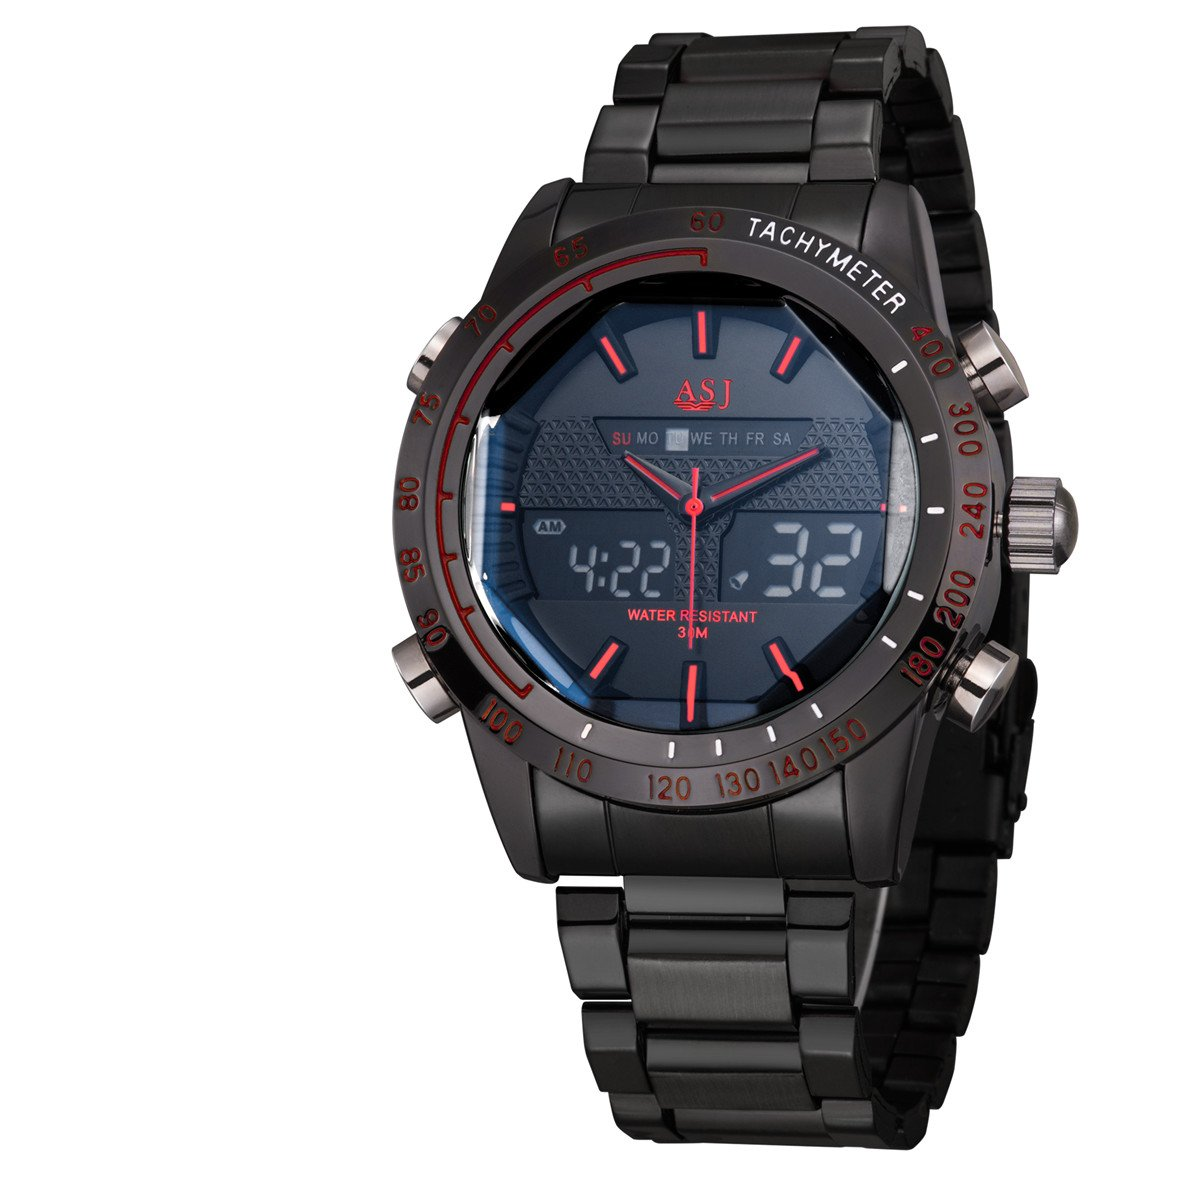 ASJメンズファッションミリタリースポーツ、デュアルディスプレイ機能クォーツ手首腕時計、防水100 ft 3# B071YLGCG2 3# 3#